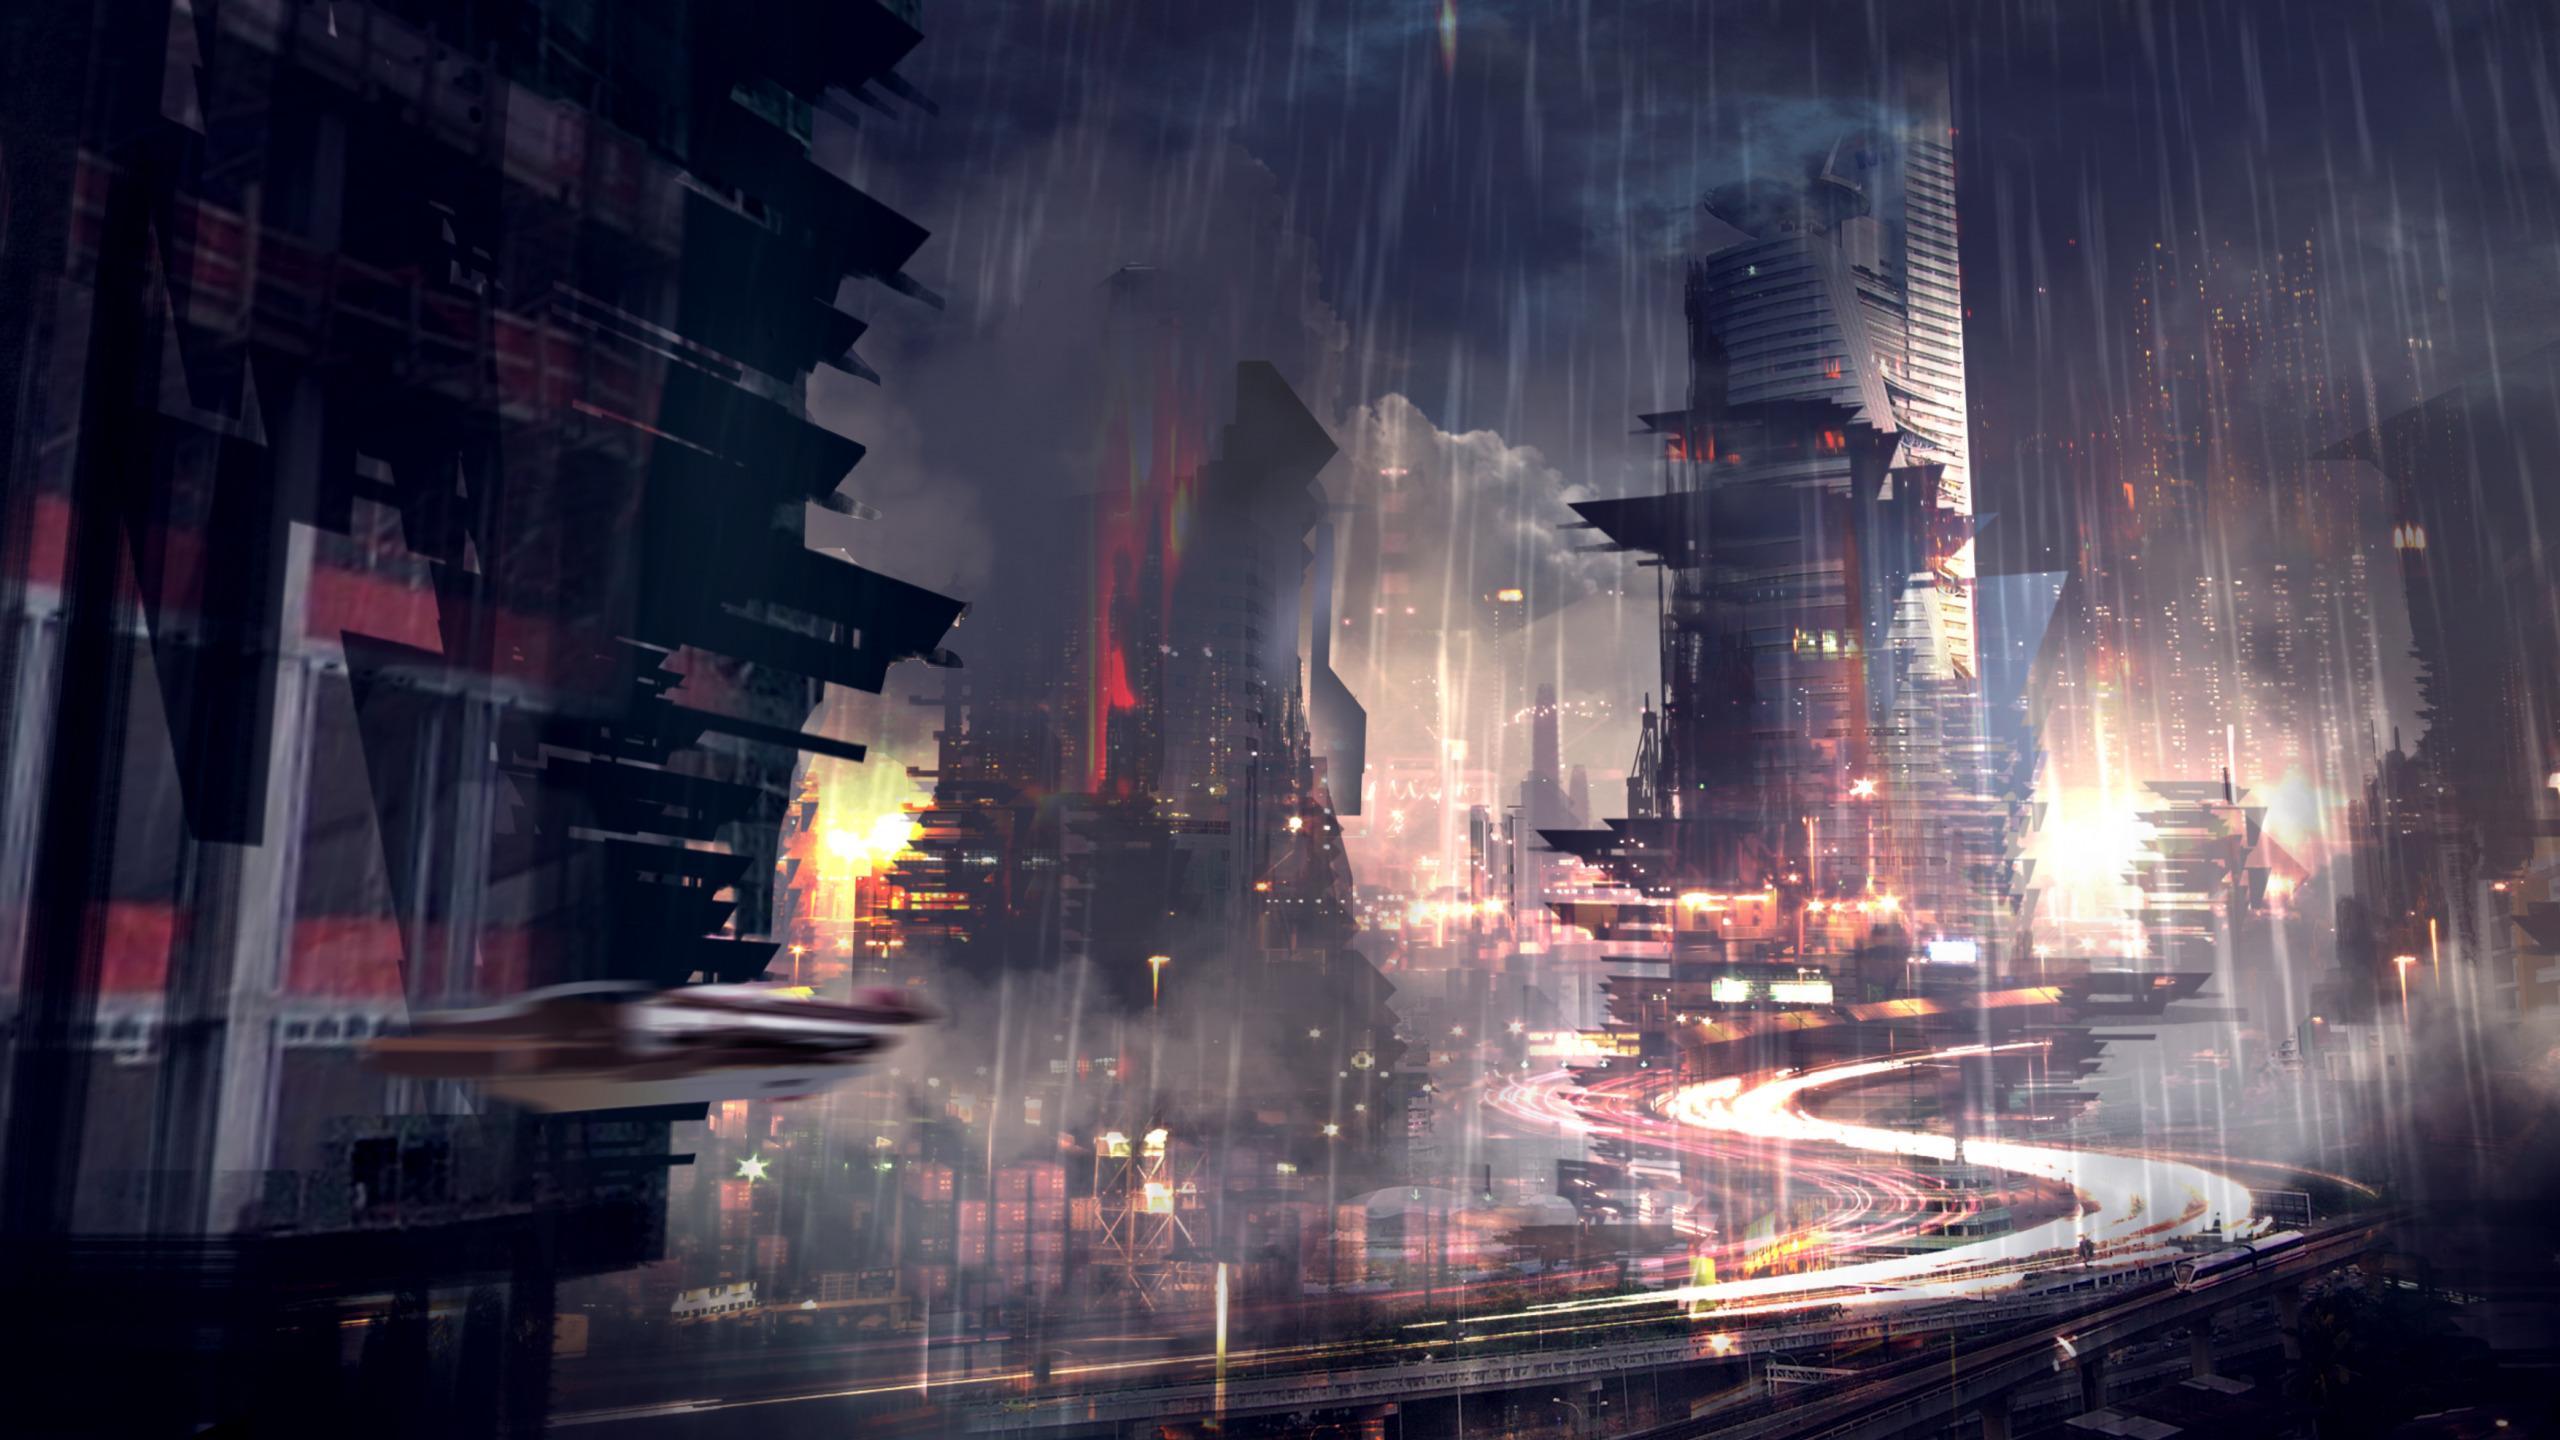 Download Wallpaper The City Future Rain Skyscrapers Noir